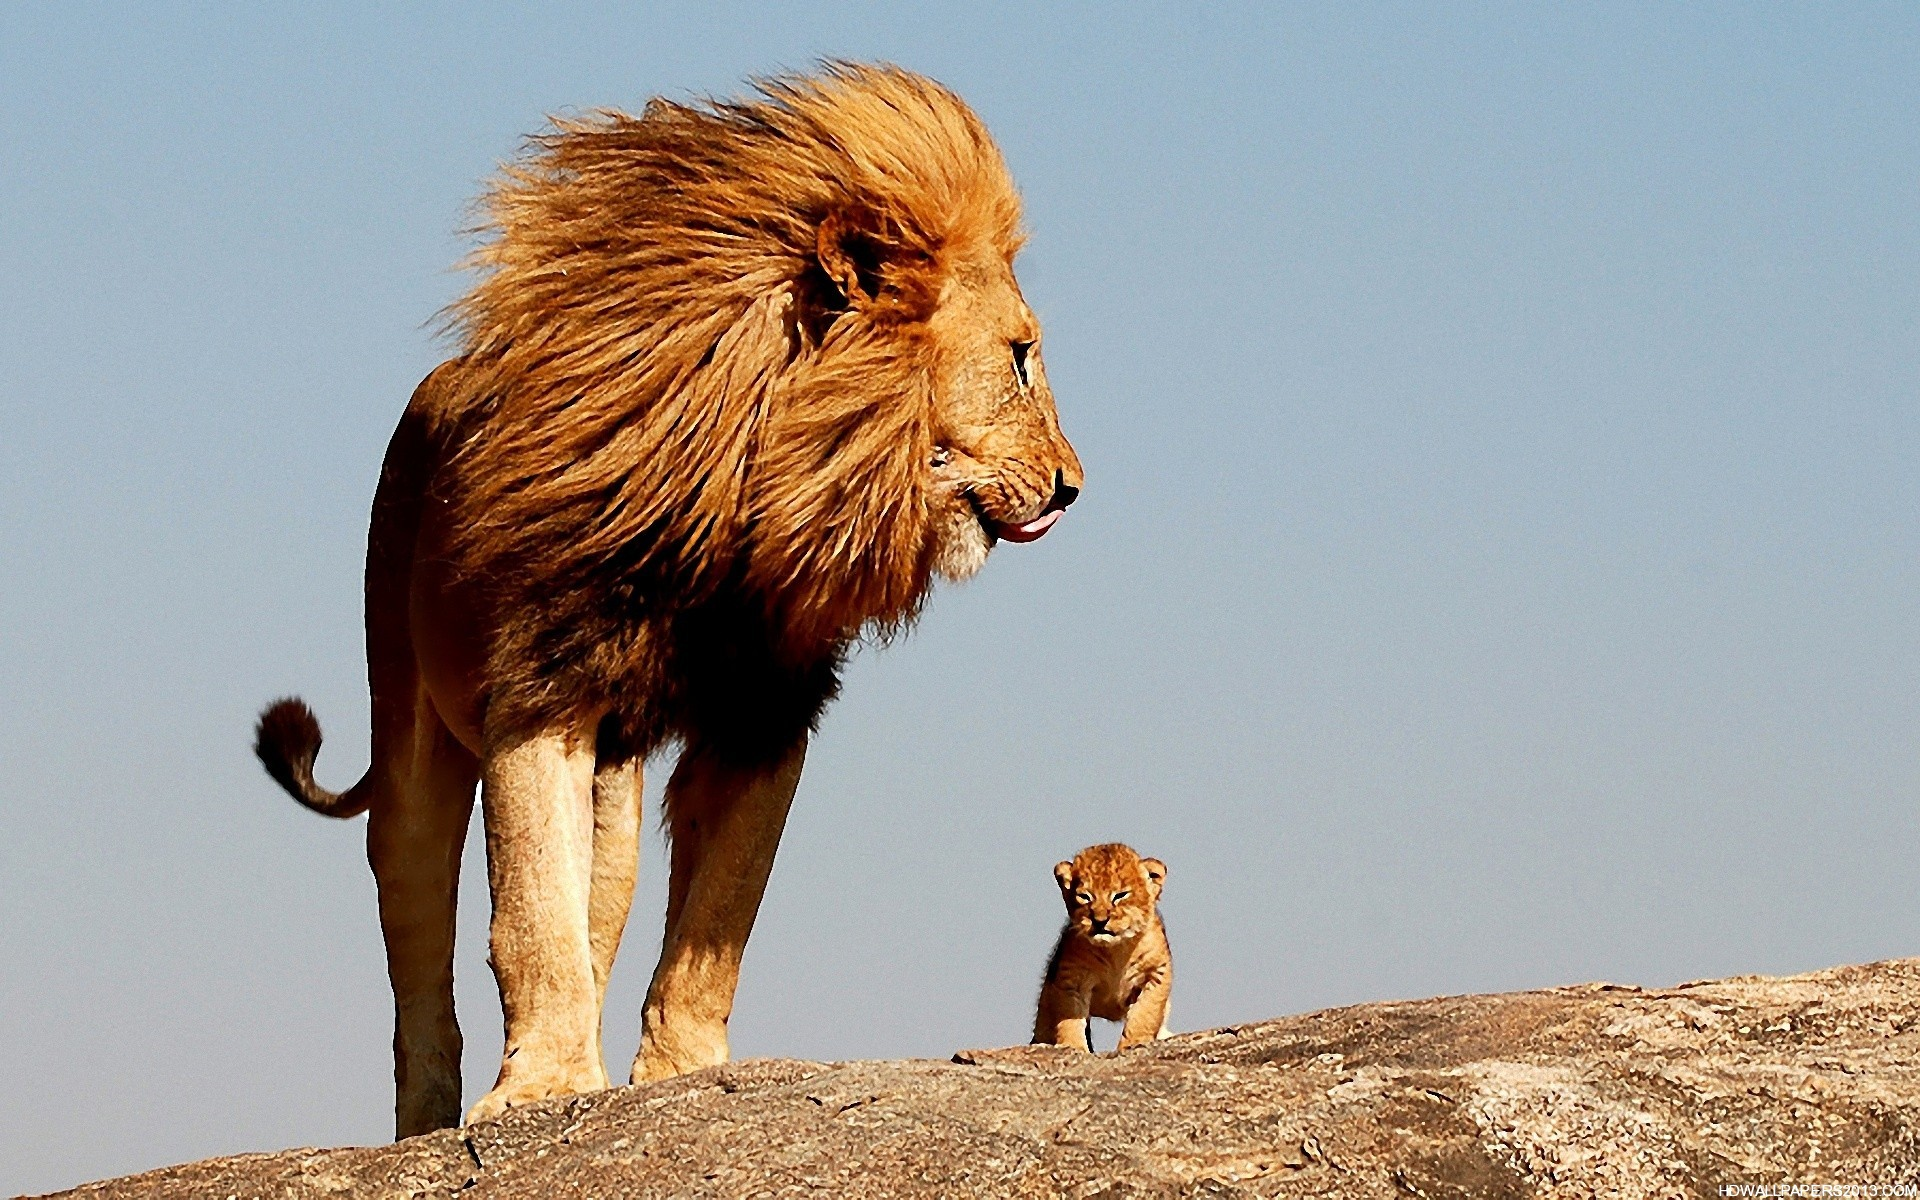 Cool Lion Wallpapers Hd Wallpapersafari